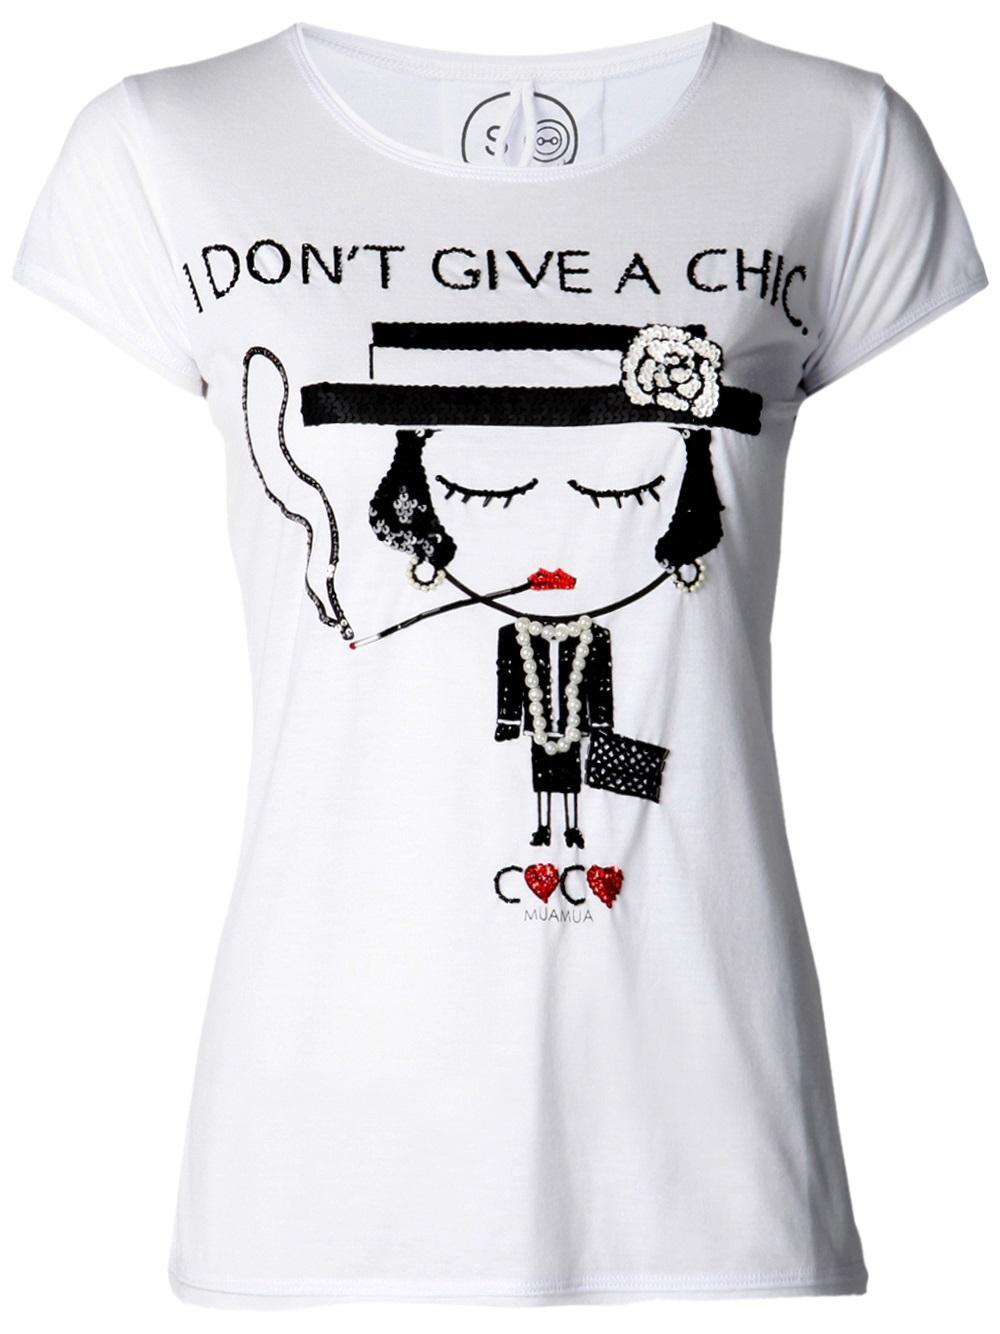 Lyst Mua Mua Coco Chanel T Shirt In White